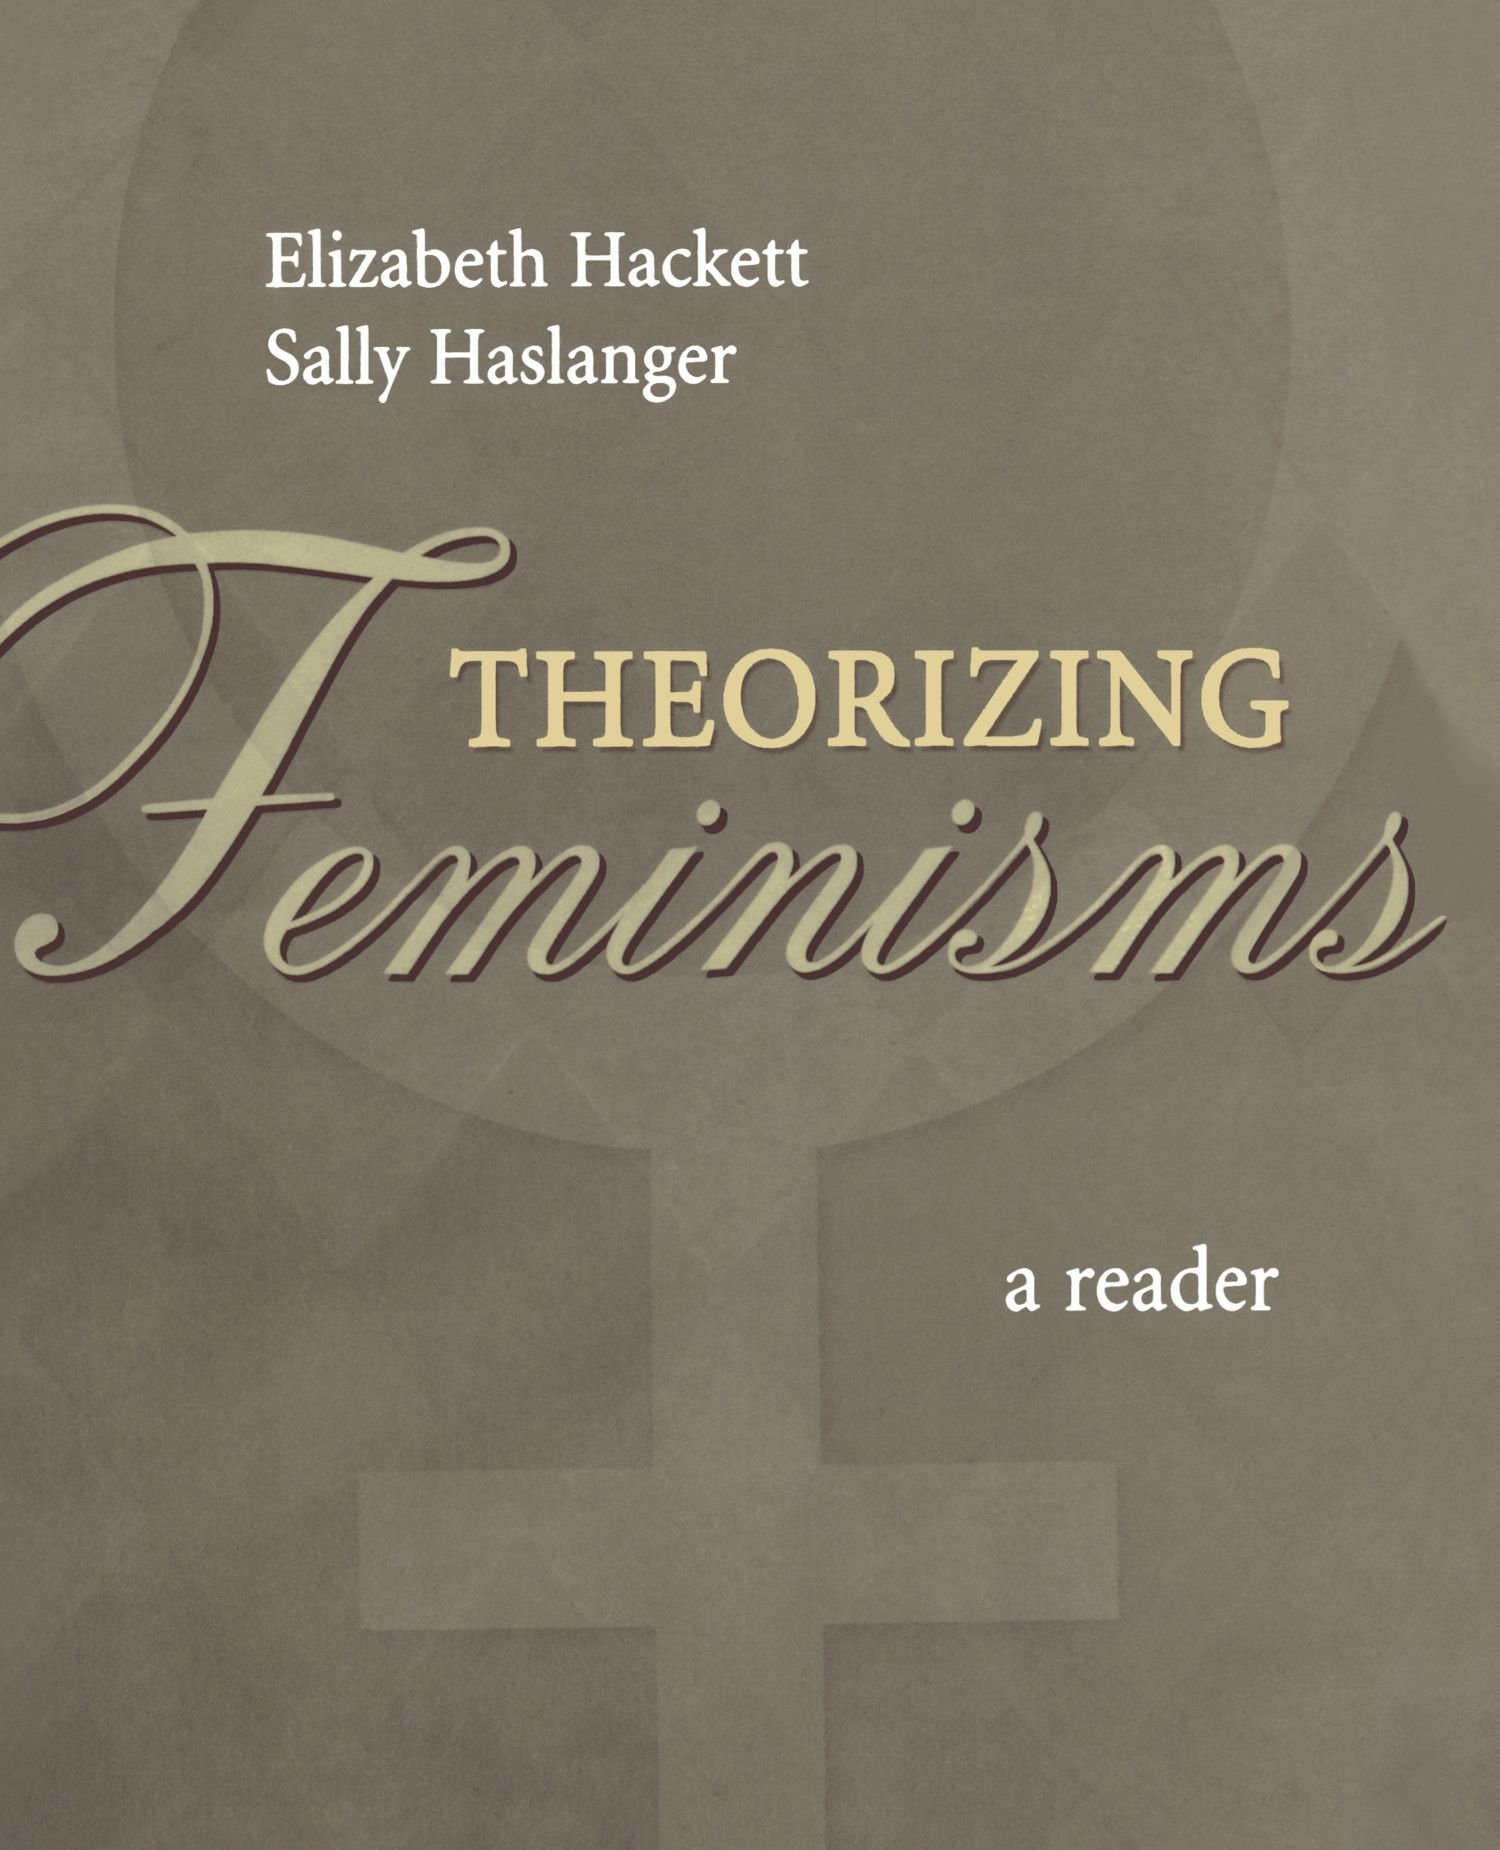 Theorizing Feminisms: A Reader